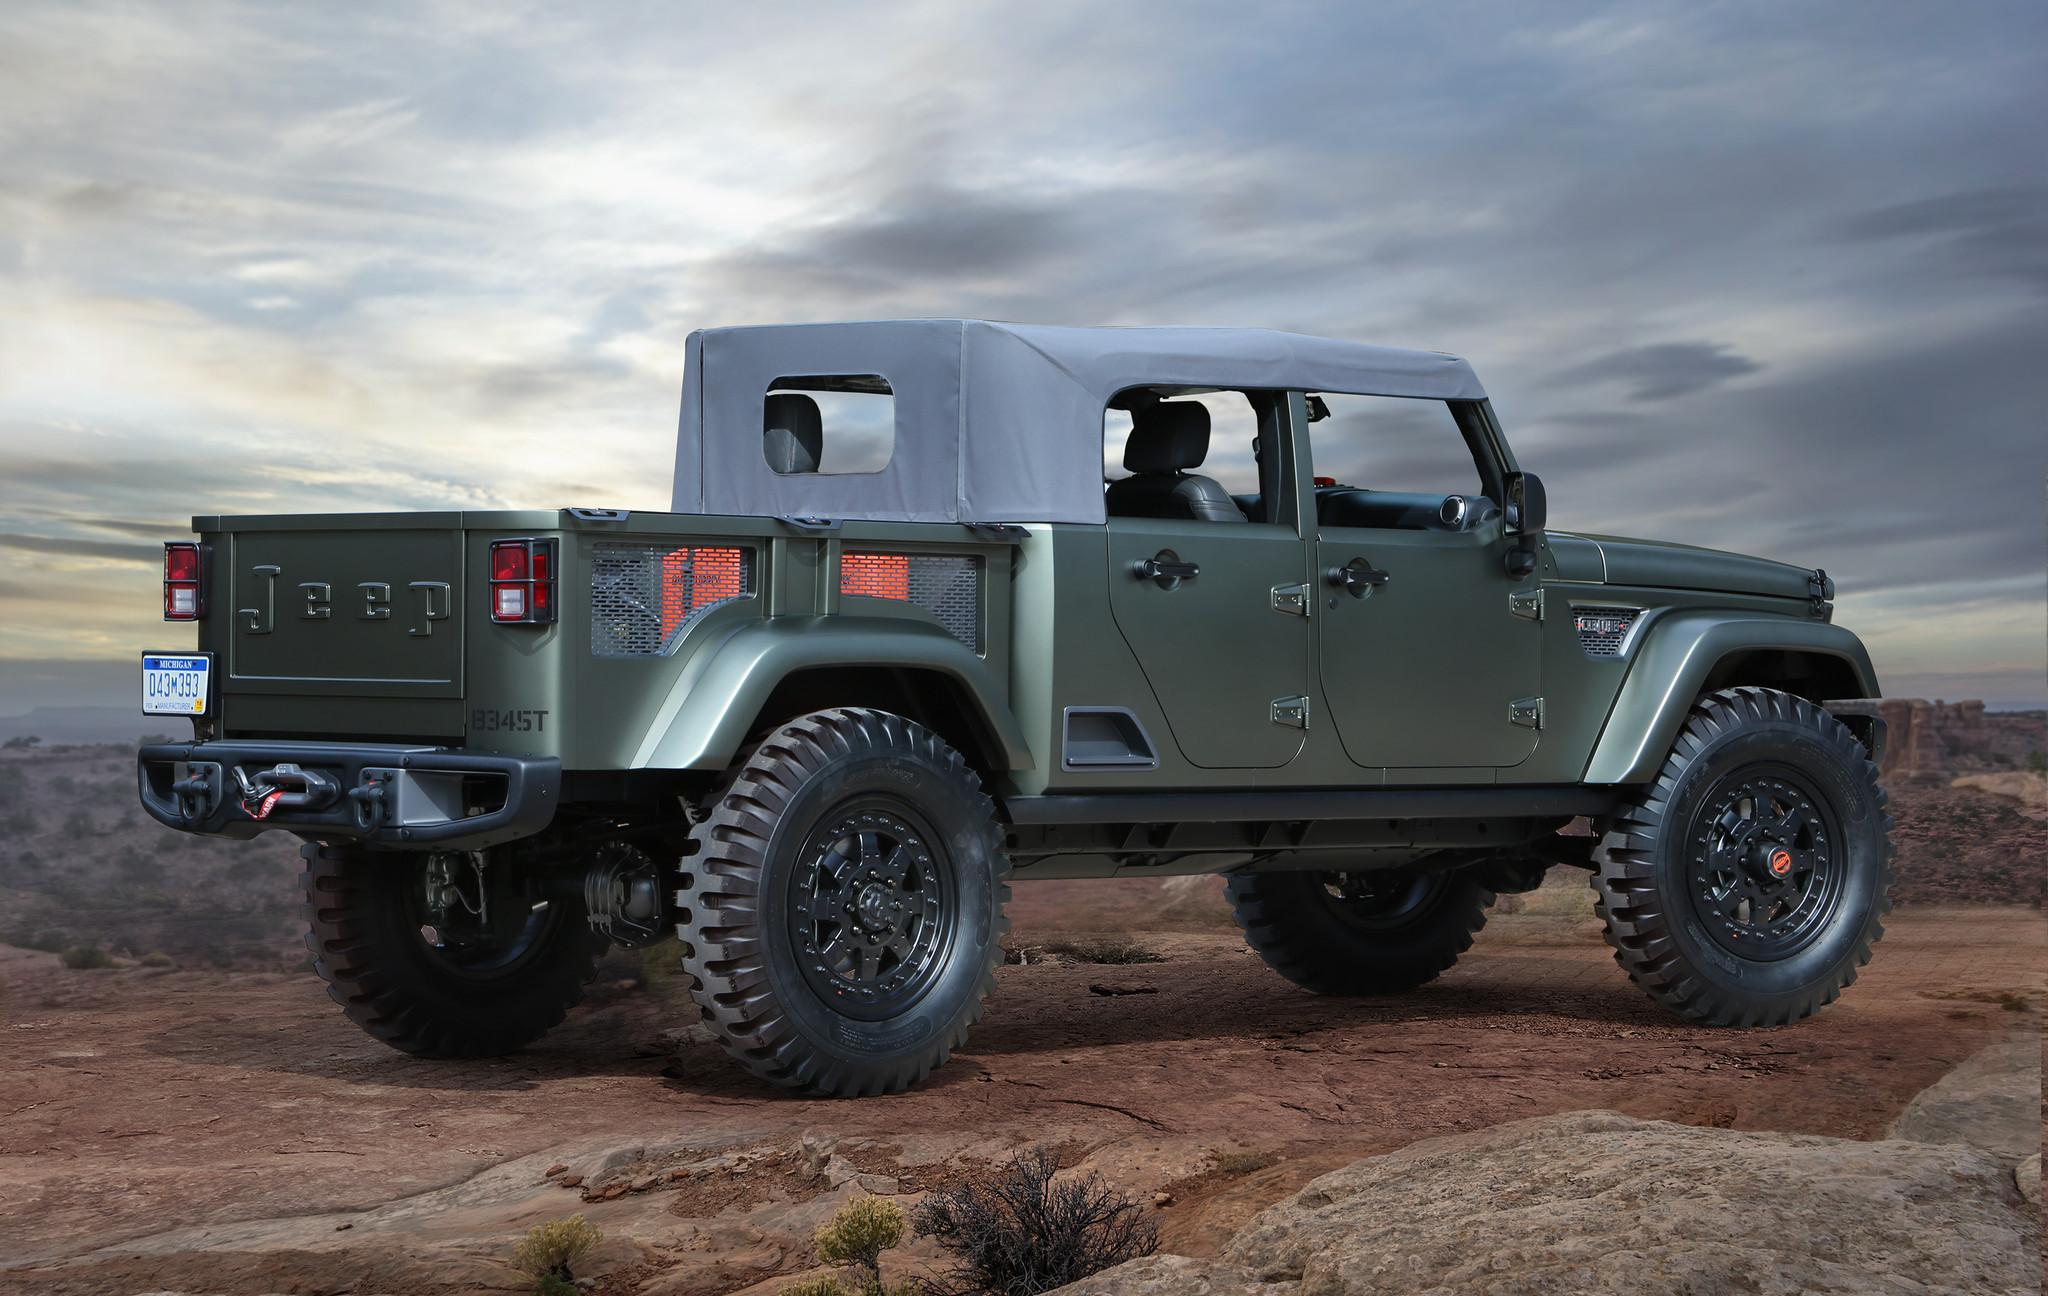 Jeep Concept 2016 >> 2016 Easter Jeep Safari Wild Off Road Concept Vehicles Chicago Tribune